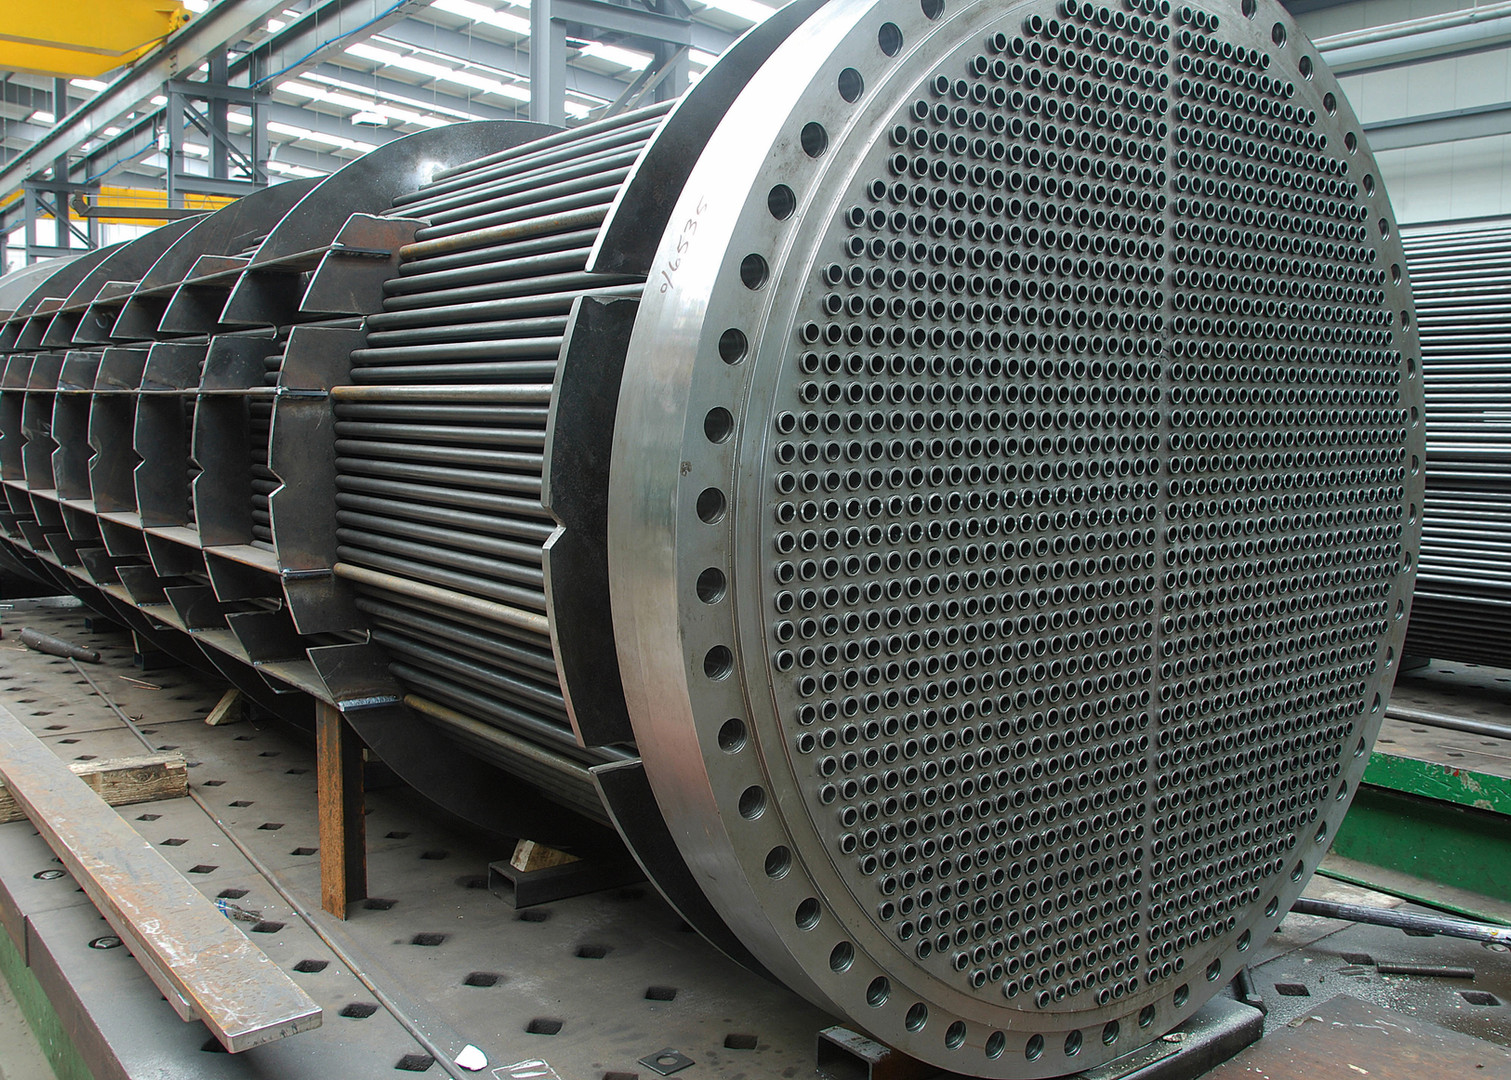 Boilers, Superheaters, Economisers, Headers, Manifolds